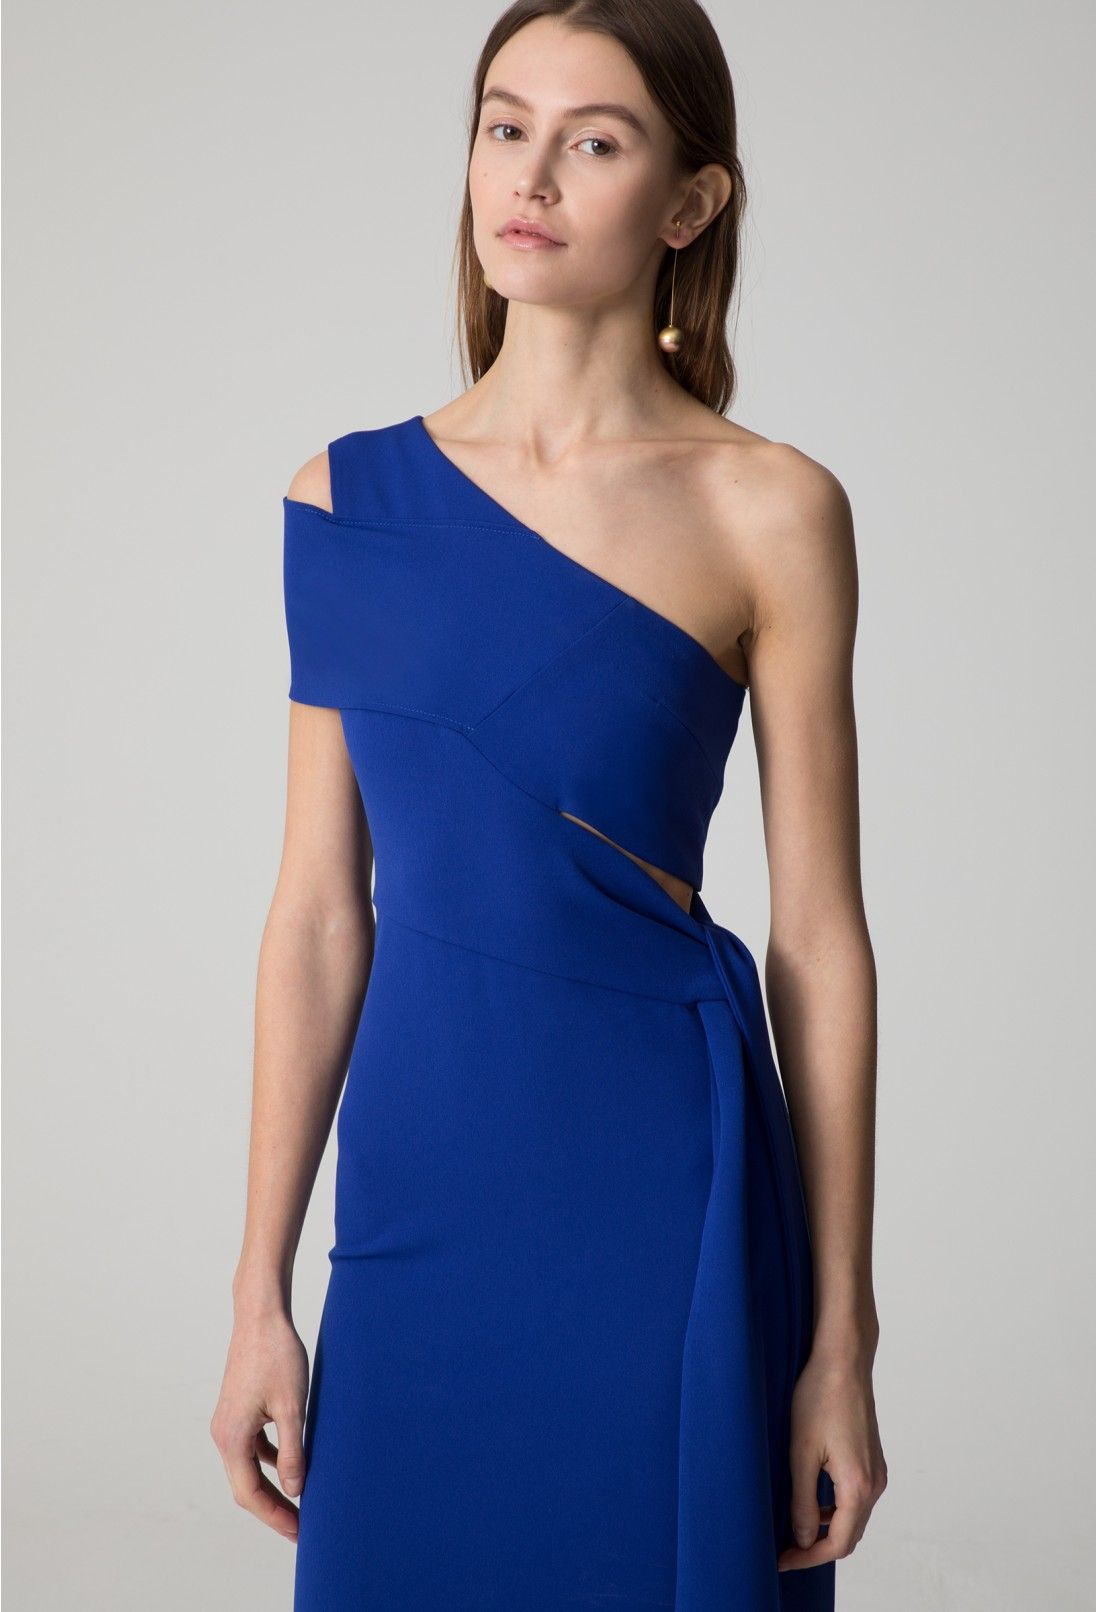 eee82a27e0 Lolita One Shoulder Midi Dress - Blue-UK 4 in 2019 | Bridal Luncheon ...